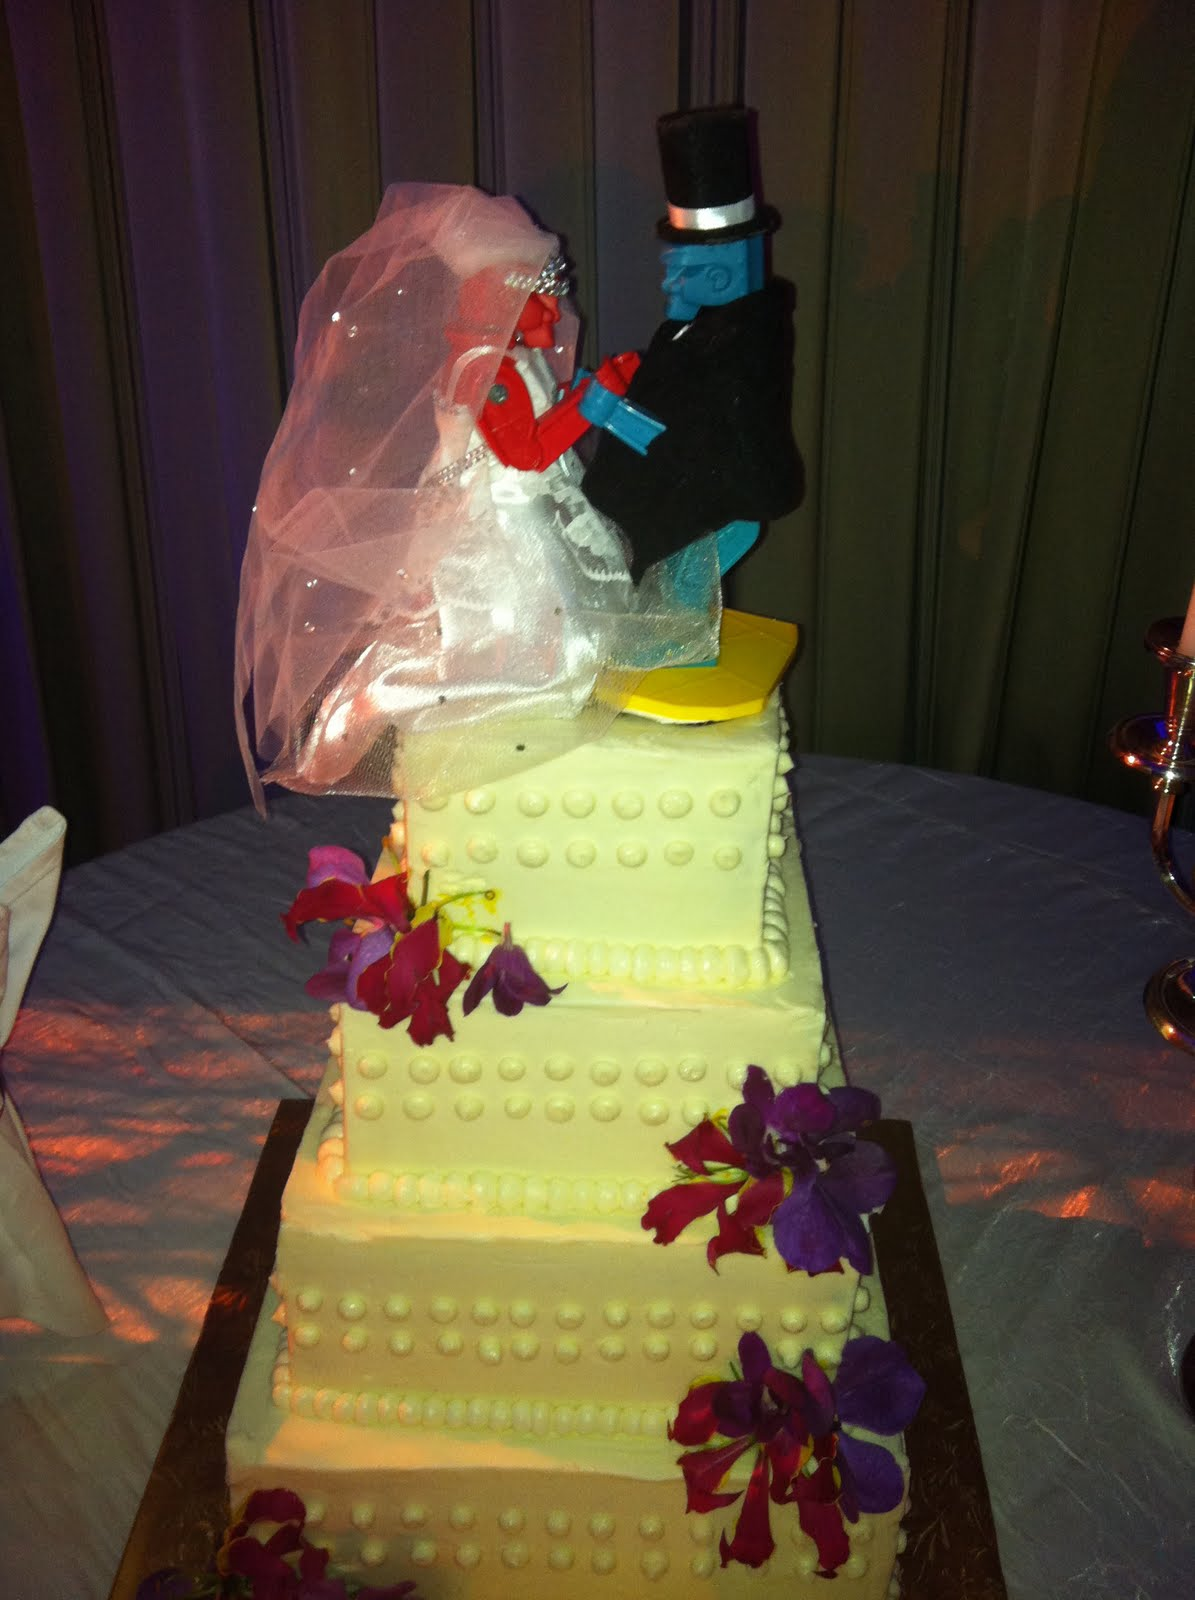 Rock Em Sock Robots Wedding Cake Topper - 5000+ Simple Wedding Cakes